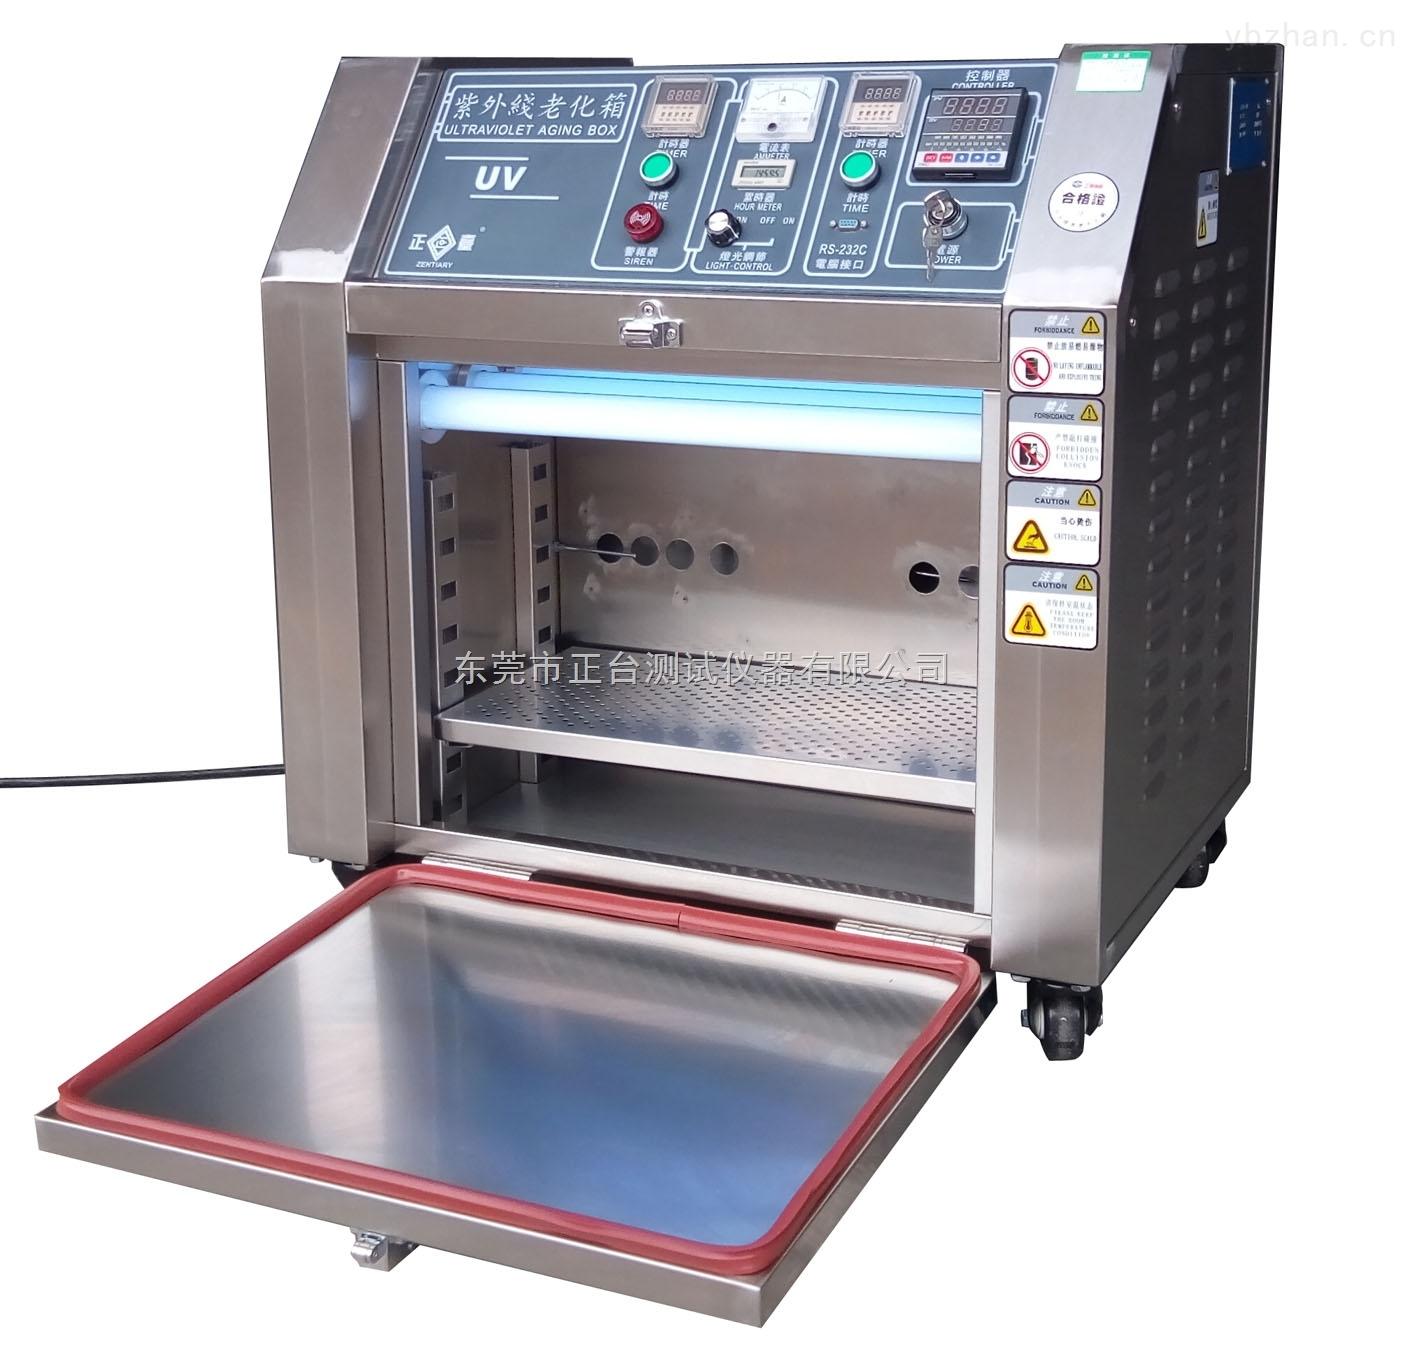 UV抗紫外线试验机/UV光照老化试验仪